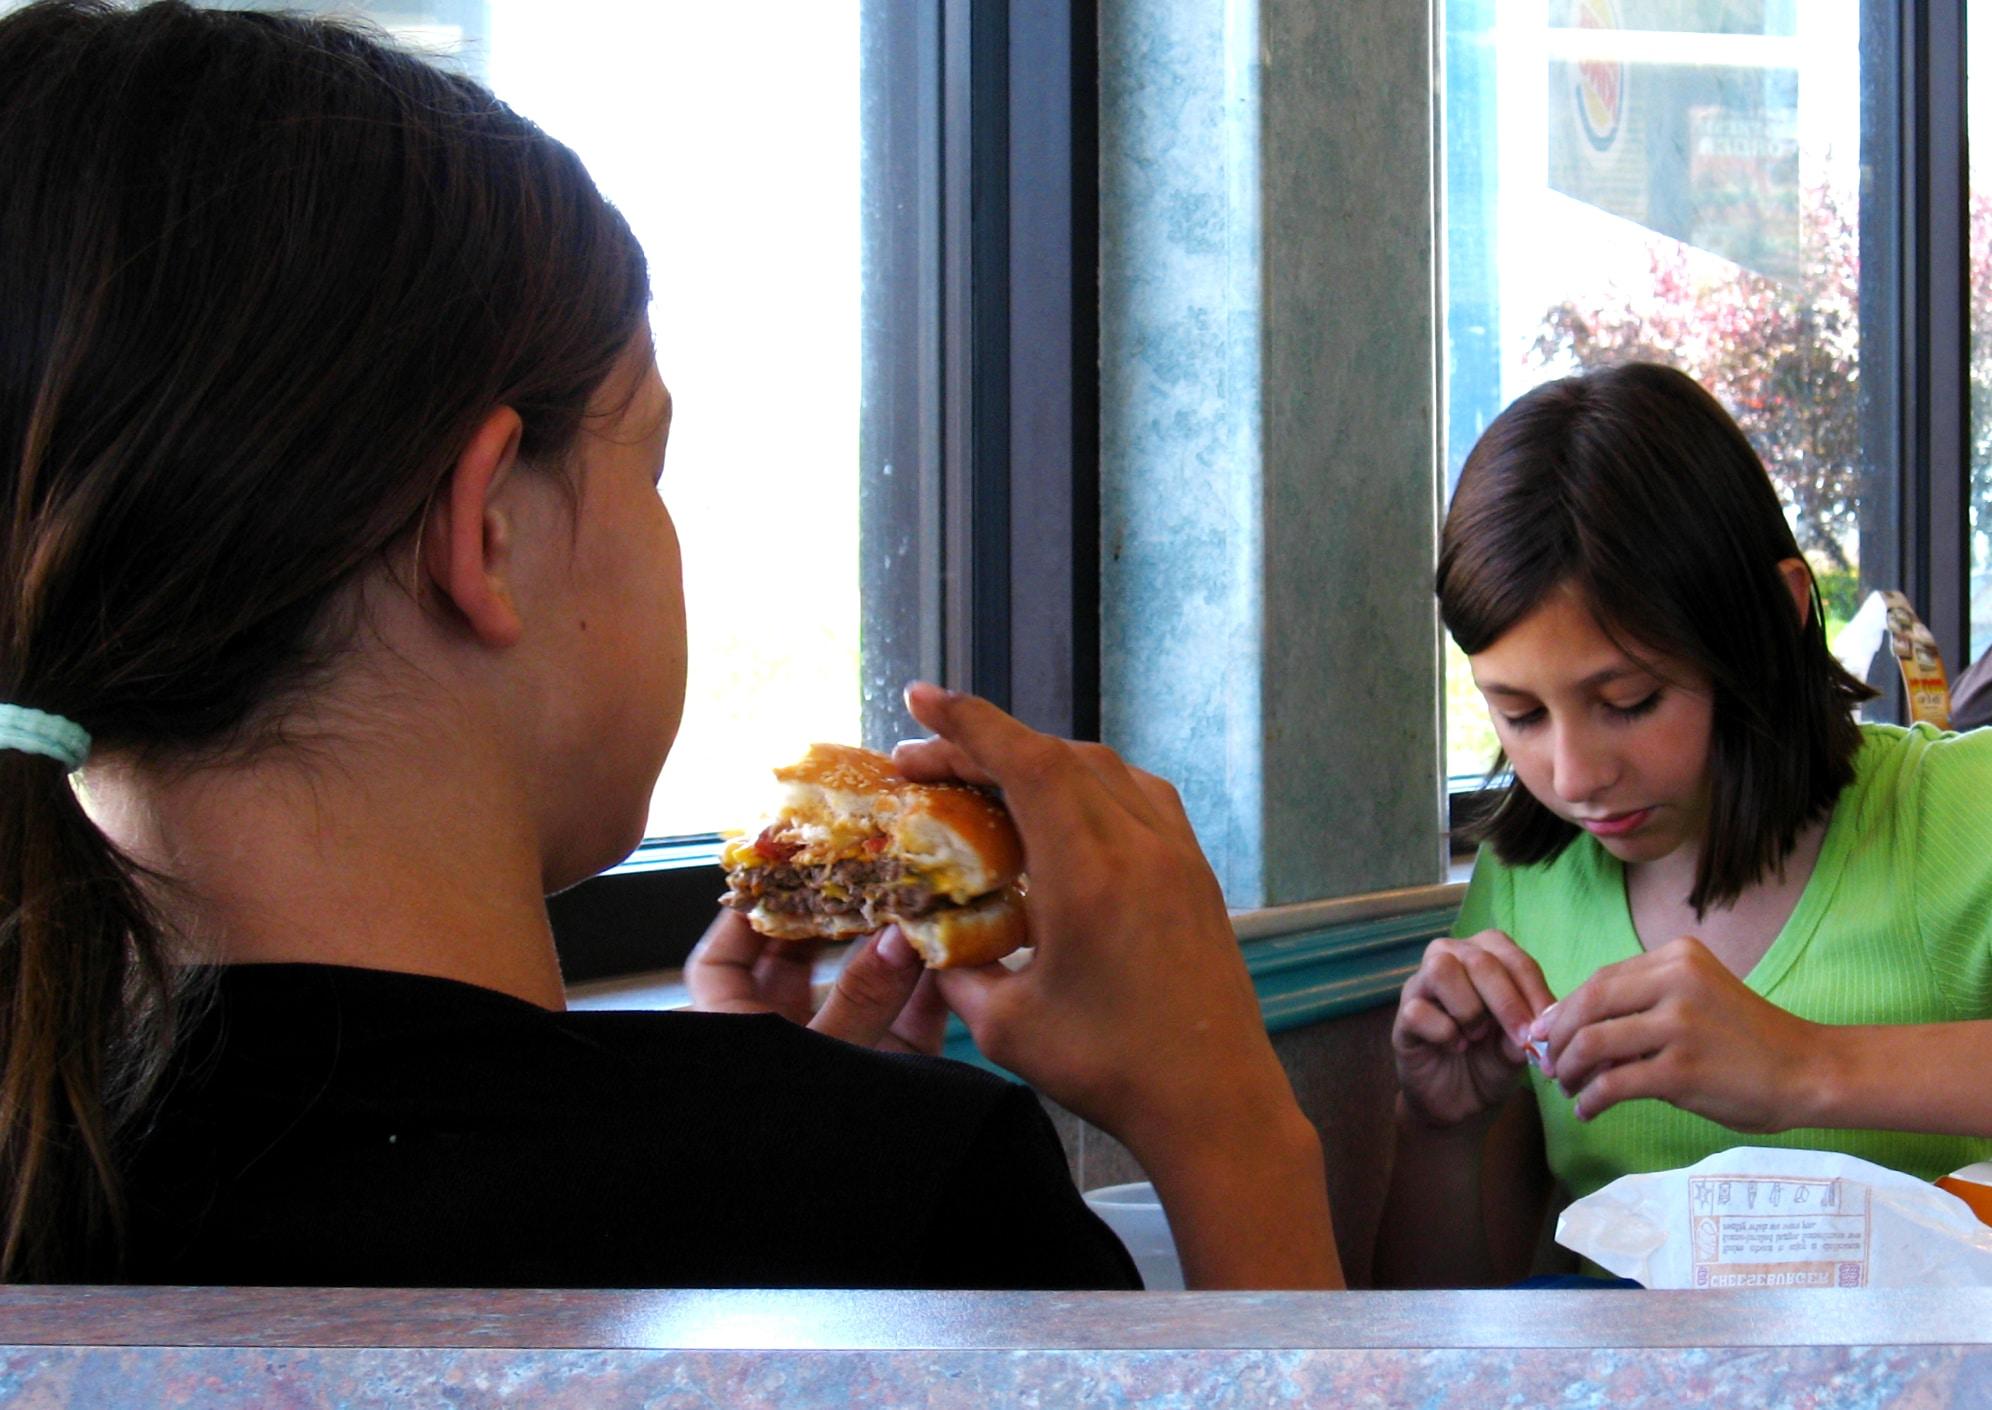 Pranzare al fast food. Immagine ripresa da Flickr/Dawna Kay in licenza CC.